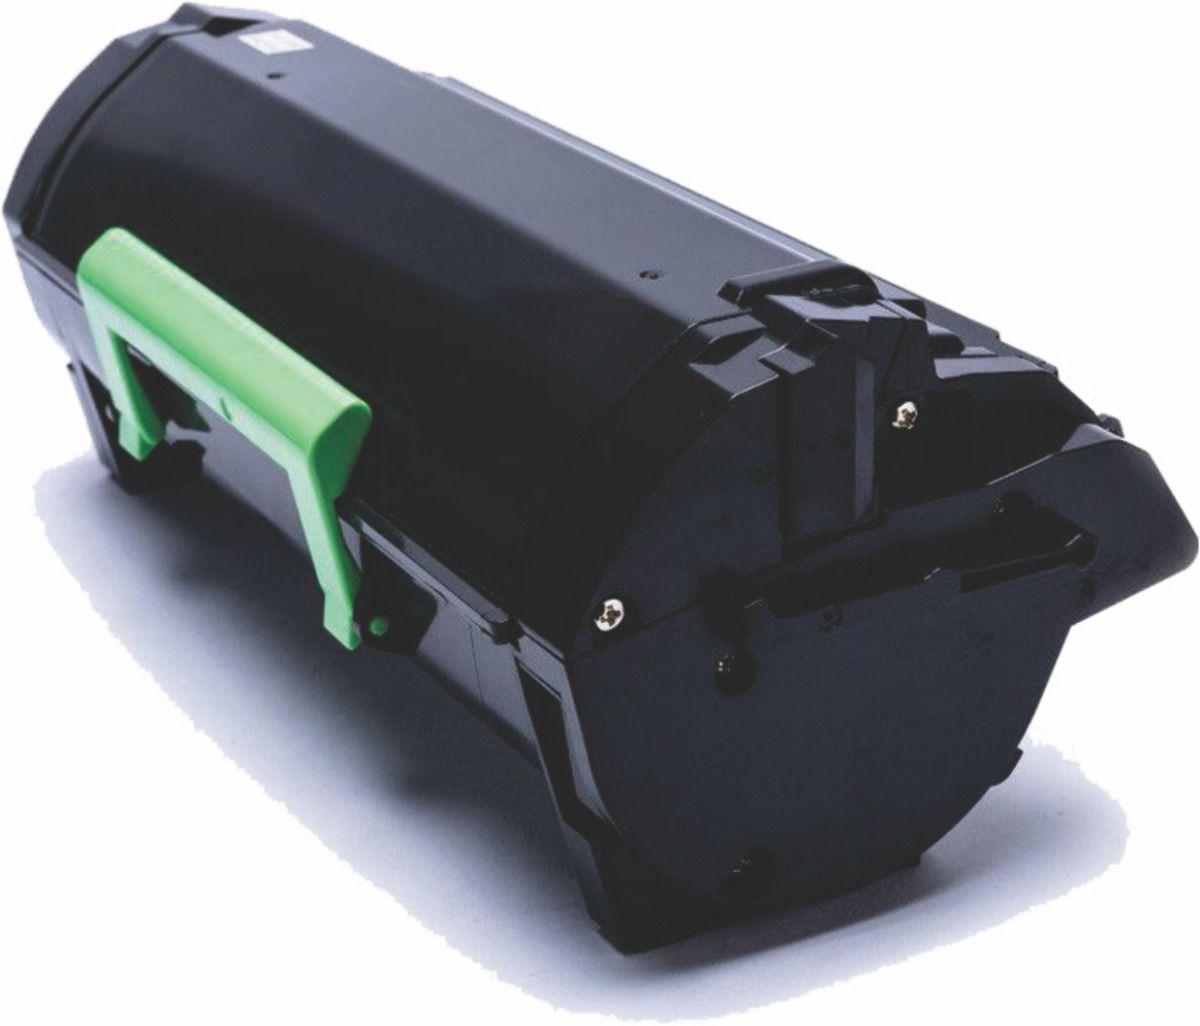 Toner Compatível Lexmark [52D4H00] Black - MX710/MX810/MX811/MX812 - 25.000 Páginas - Cartucho & Cia